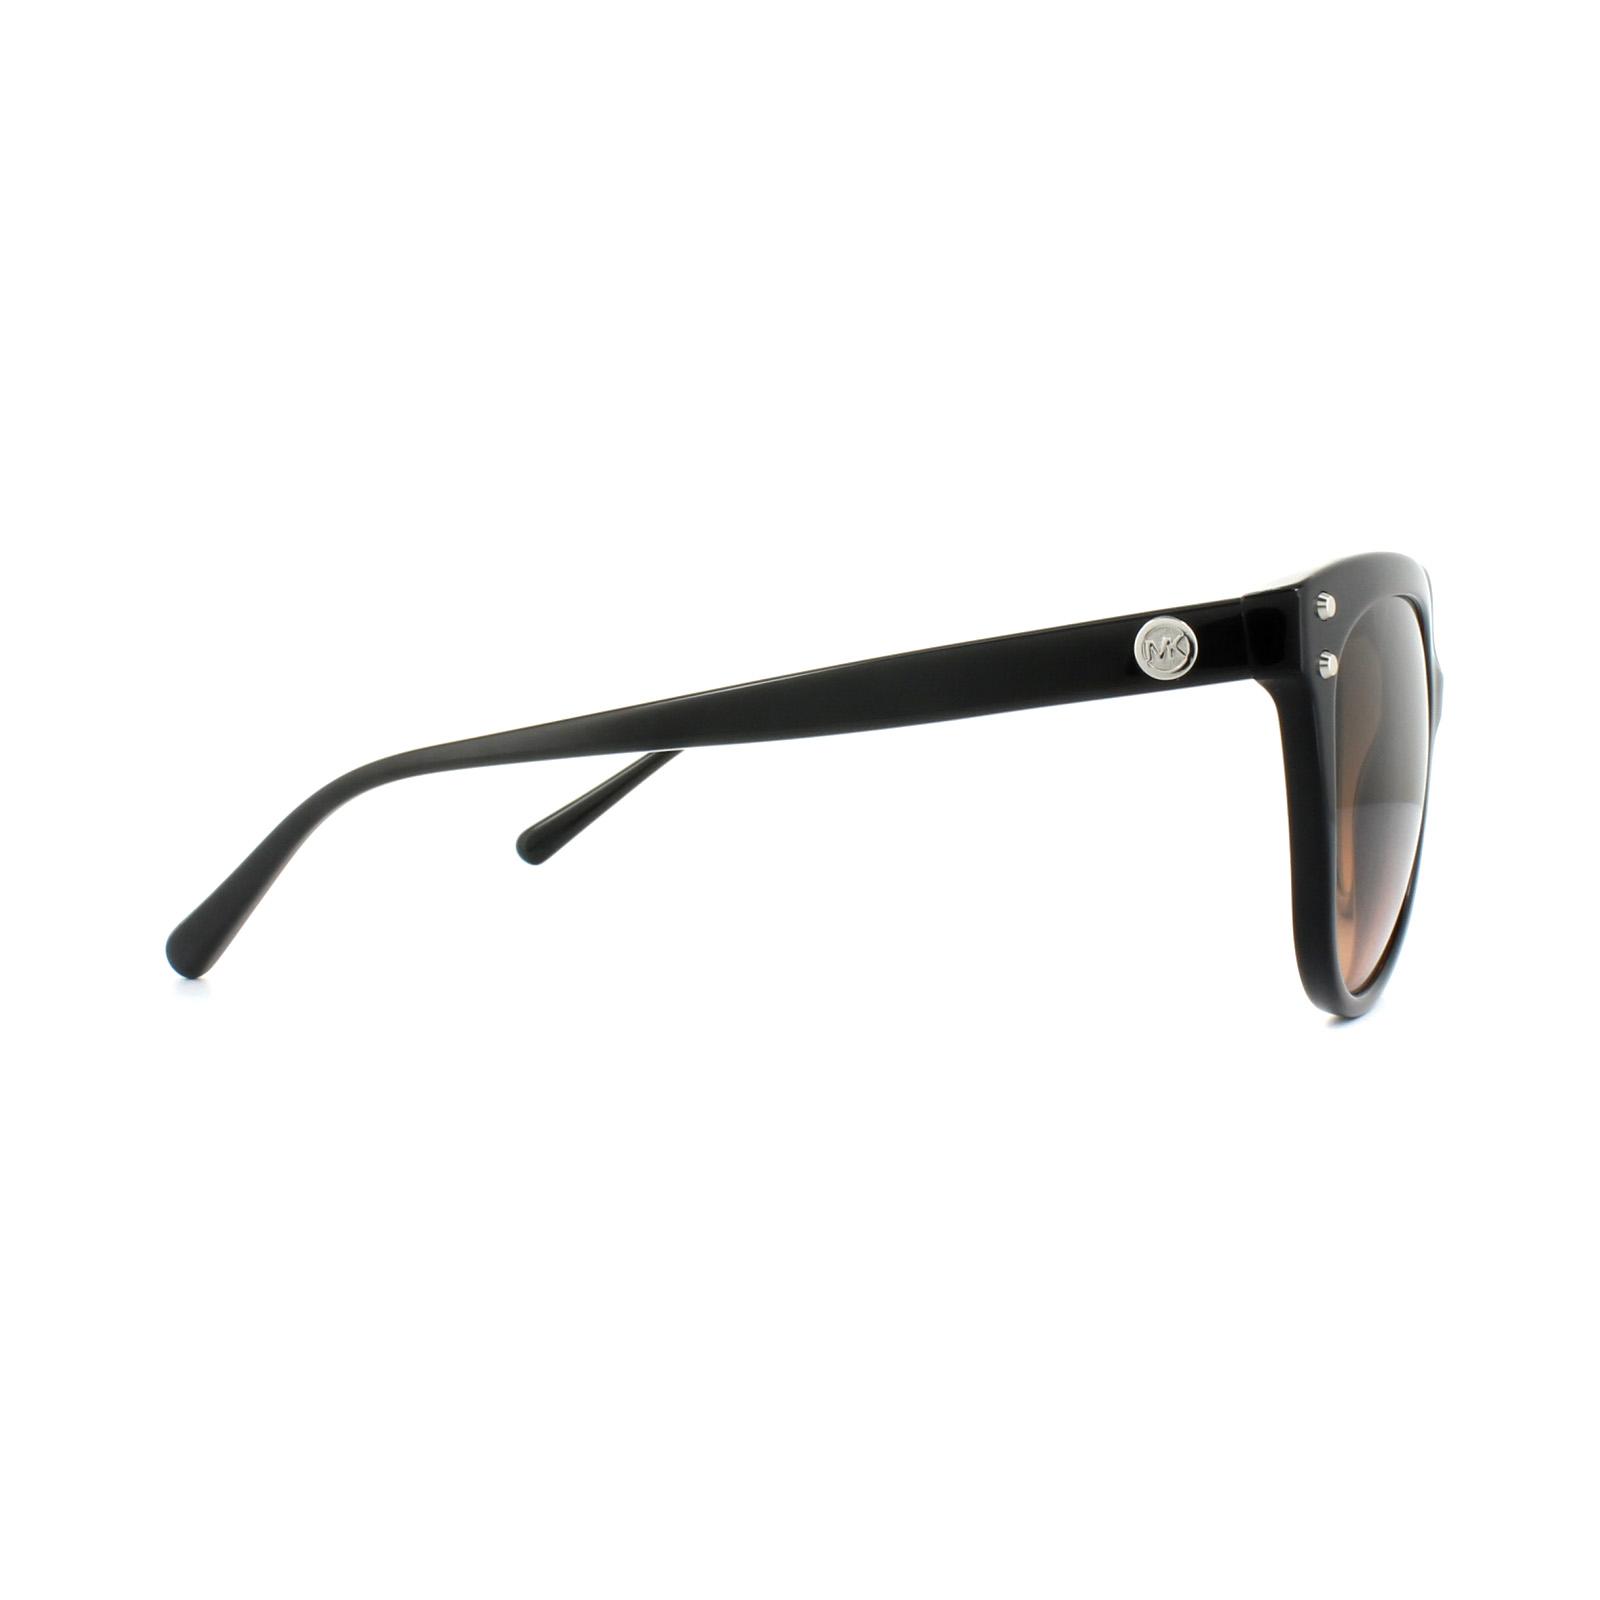 d762e3baae0e8 Sentinel Michael Kors Sunglasses Jan 2045 3177 11 Black Grey Brown Gradient